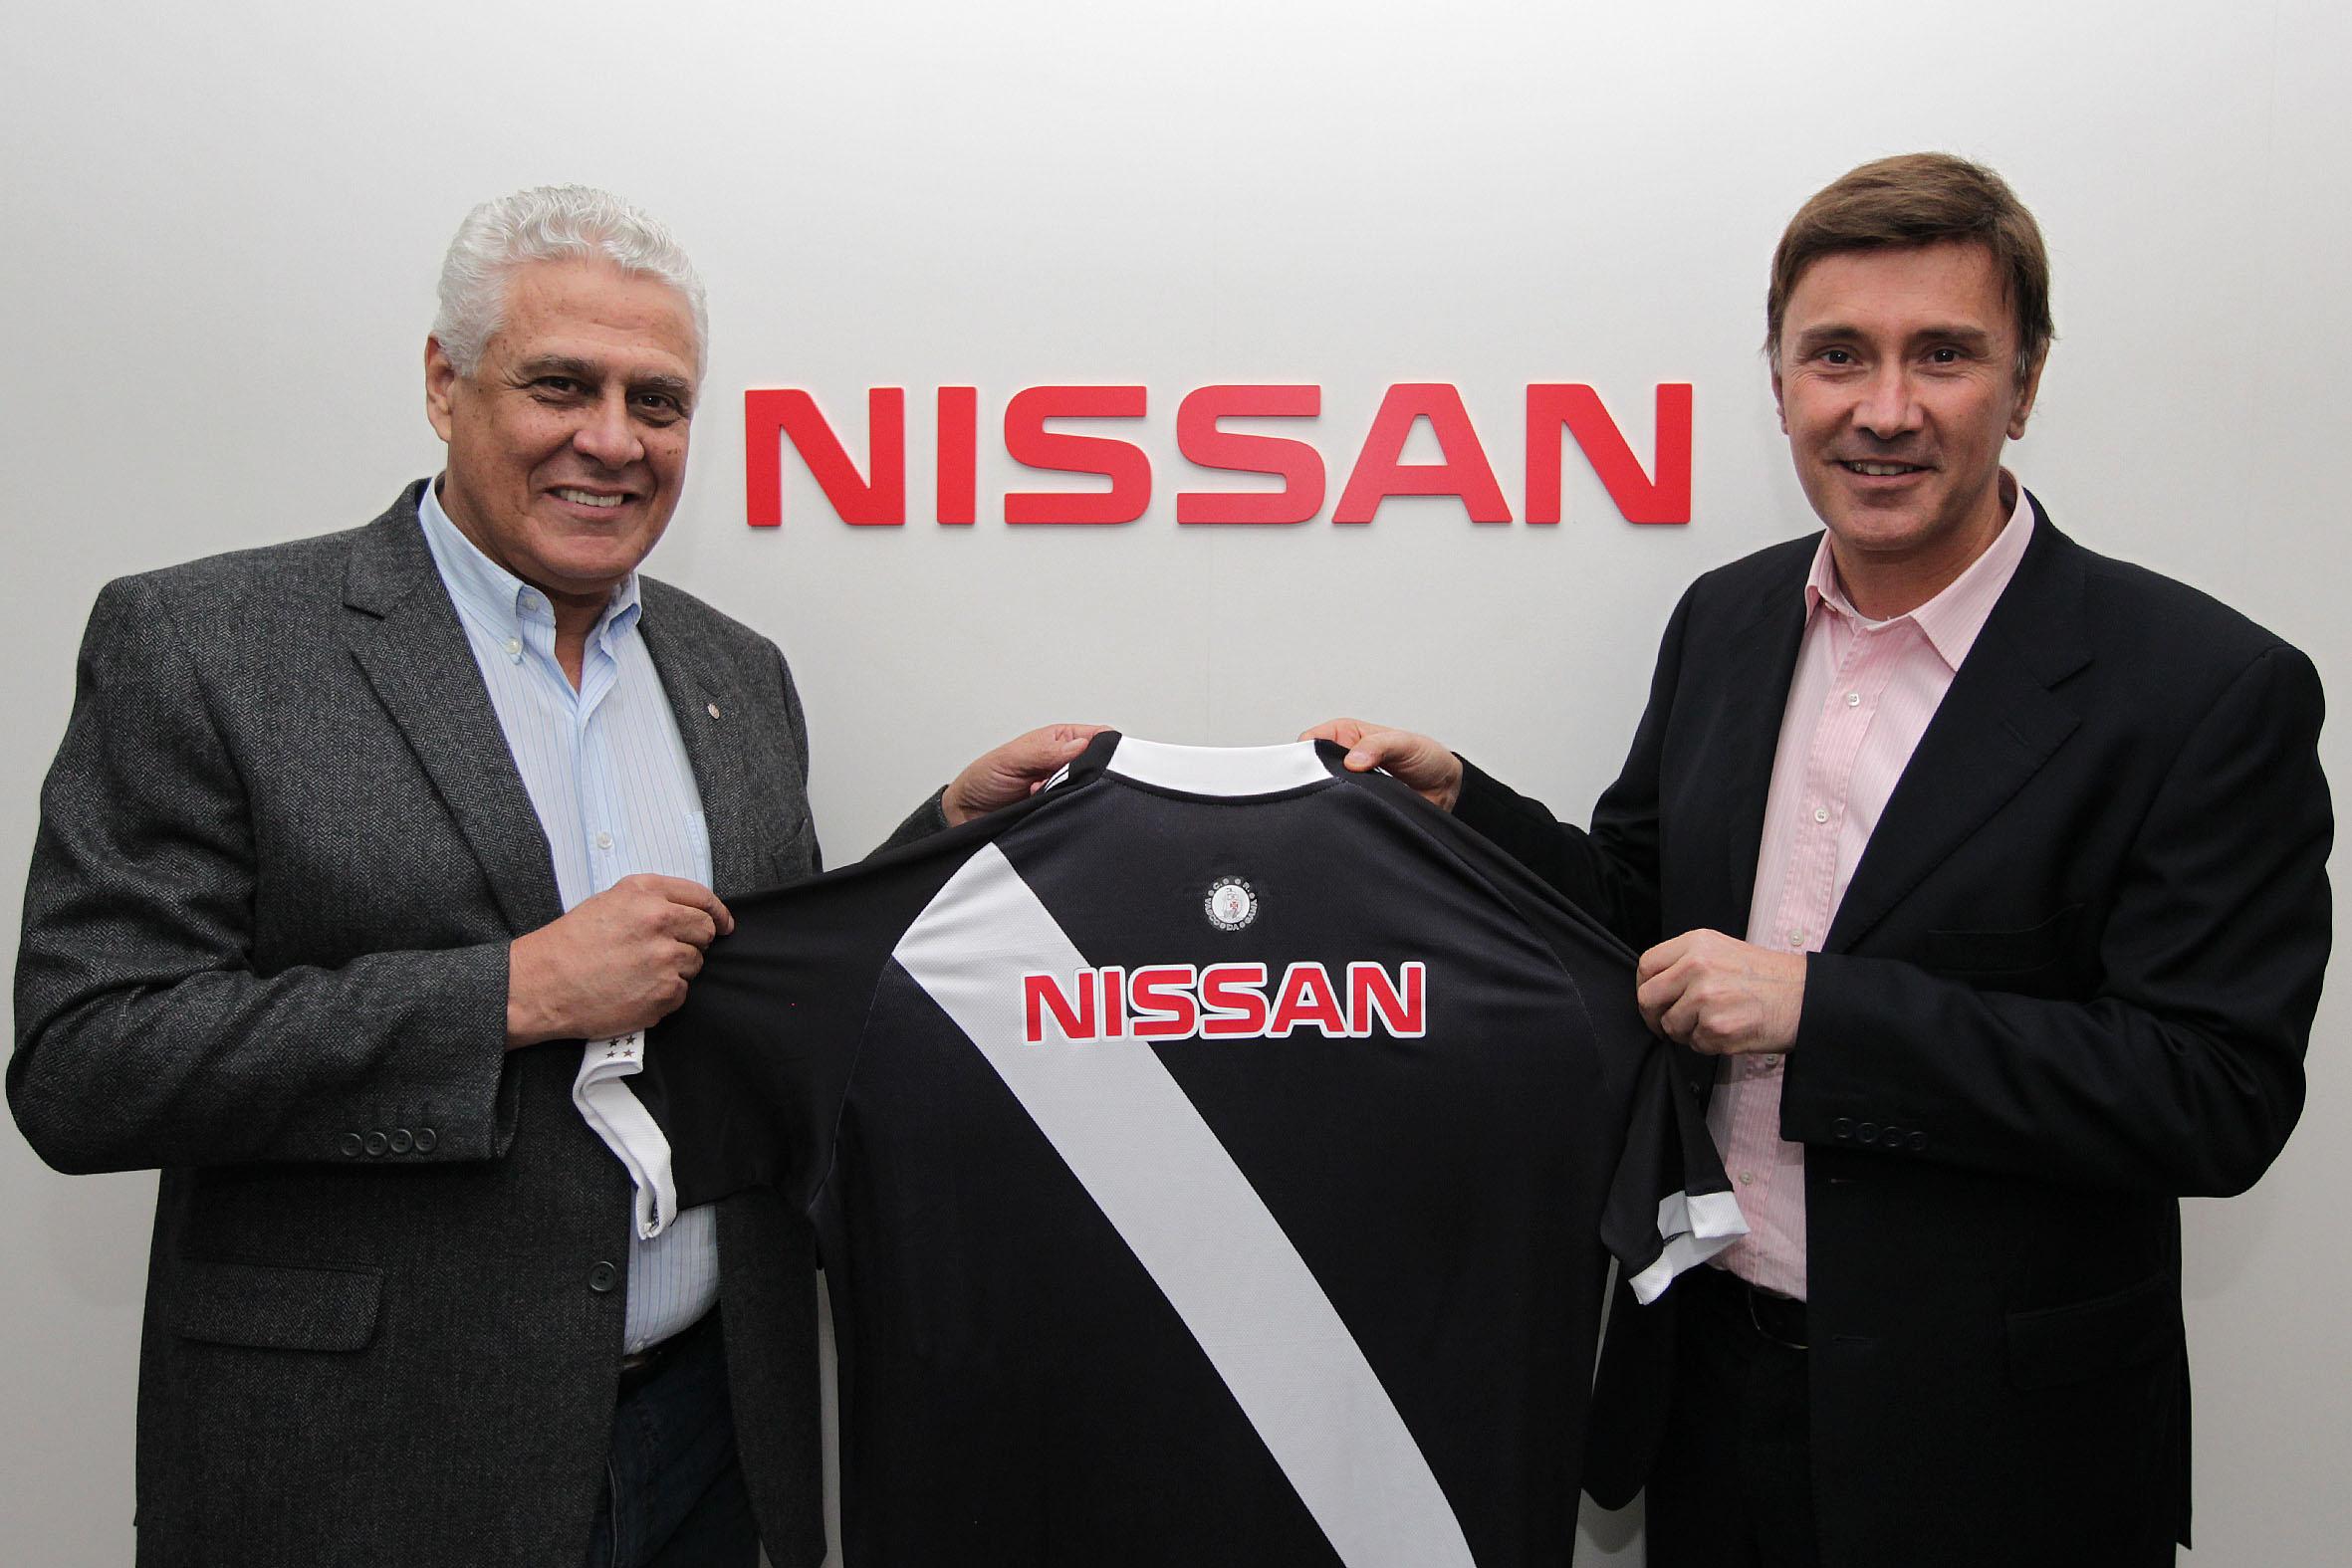 presidente do vasco e da nissan anunciam patrocinio